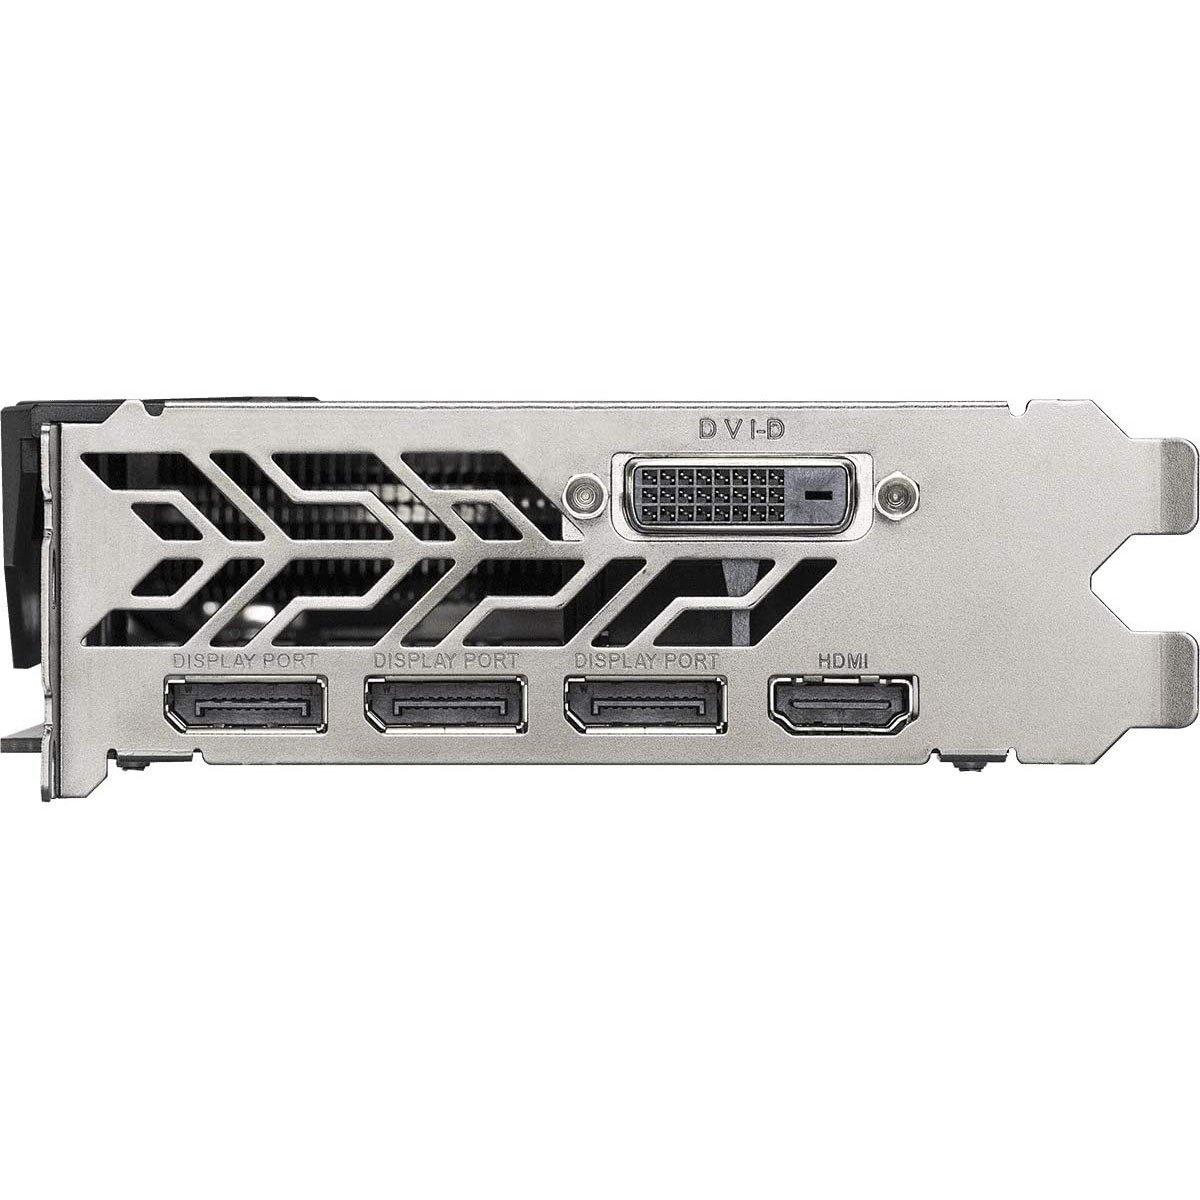 placa de video 4gb asrock rx 570 dual amd radeon phantom caming graphics card 2000mhz 256bit gddr6 dp dvi hdmi 51080 2000 203646 1